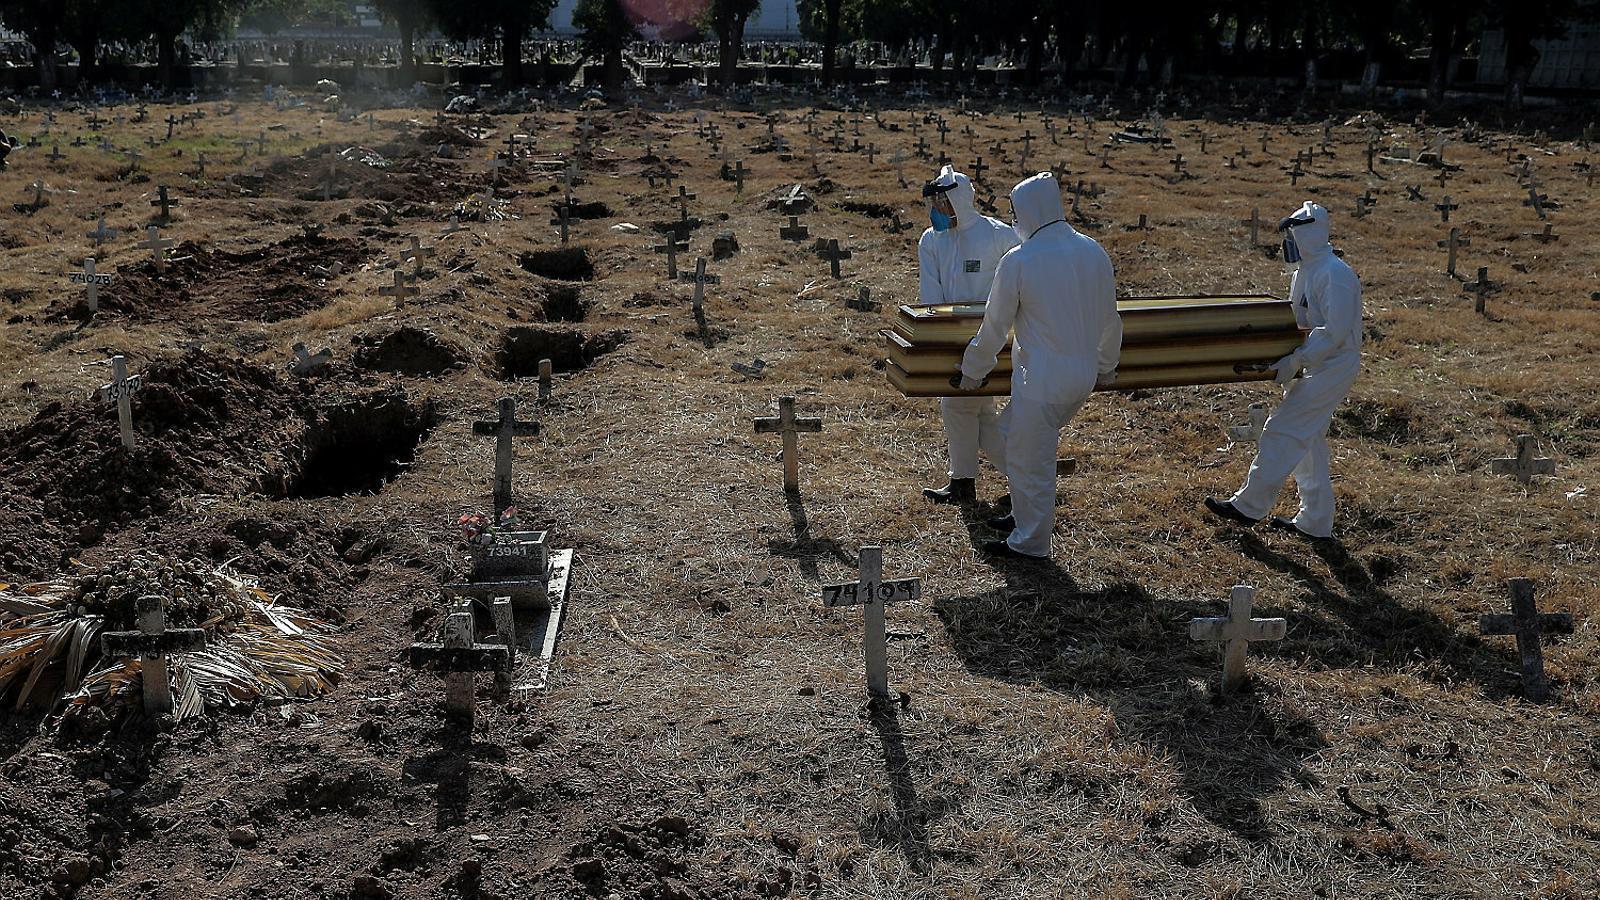 Operaris del cementiri de Cajú, a Rio de Janeiro, portant a enterrar  el taüt d'una víctima mortal del coronavirus.